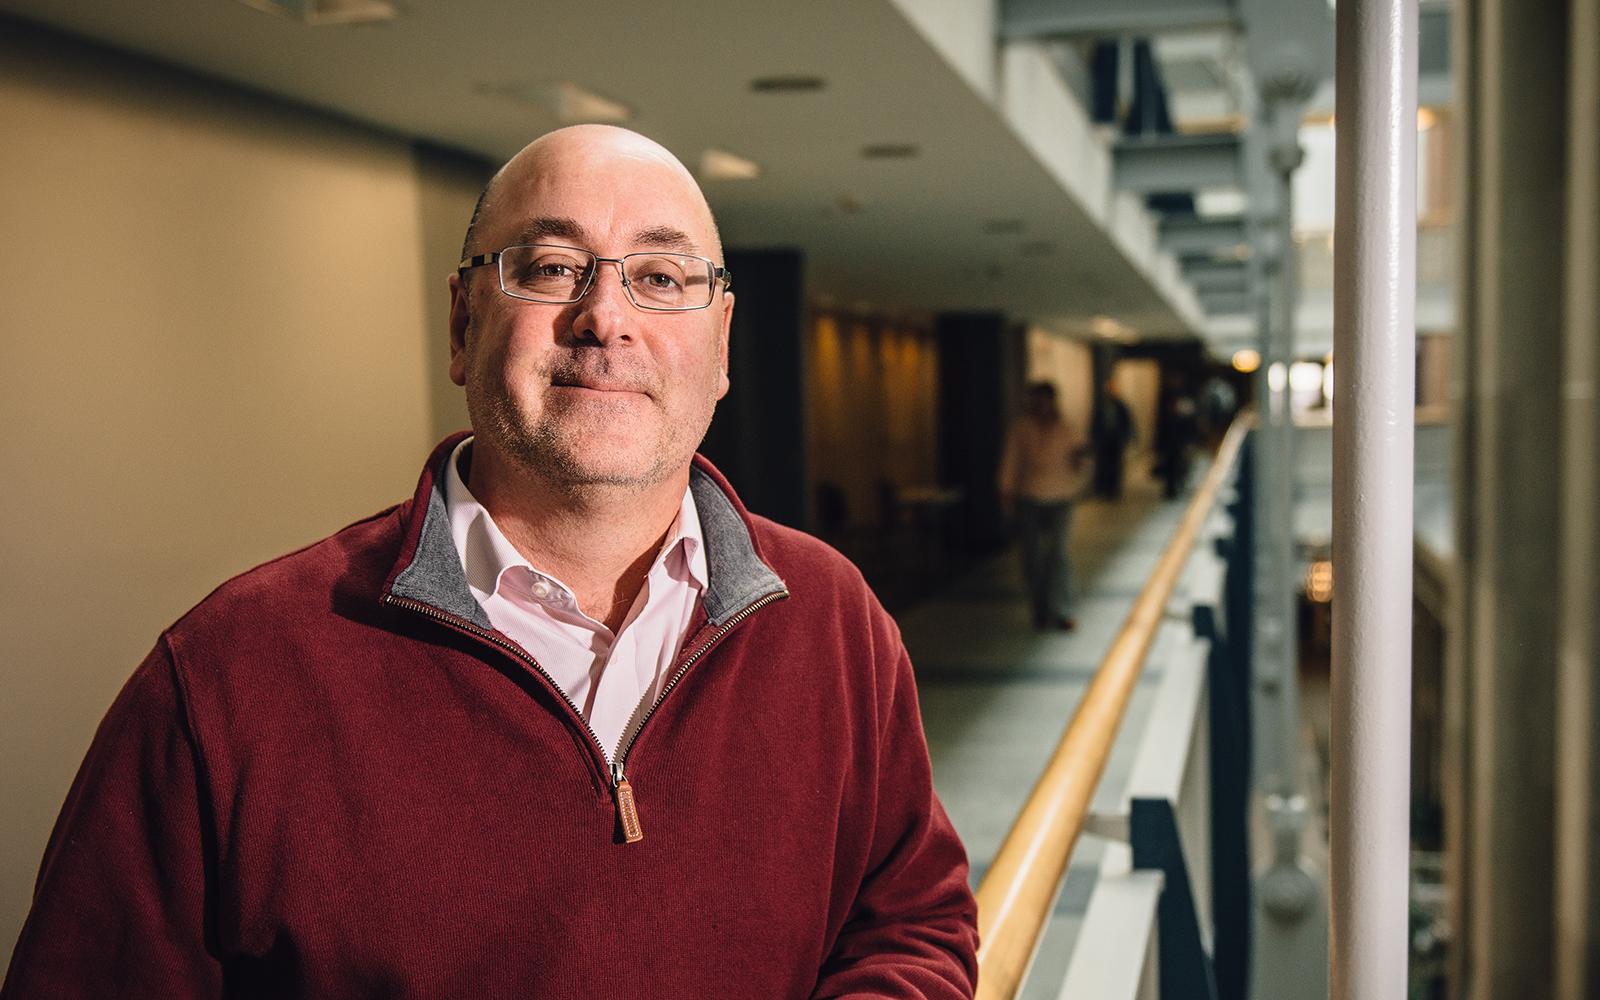 School of Business alumnus Joseph Briody '86, UConn's associate director for leadership development. (Nathan Oldham/UConn School of Business)